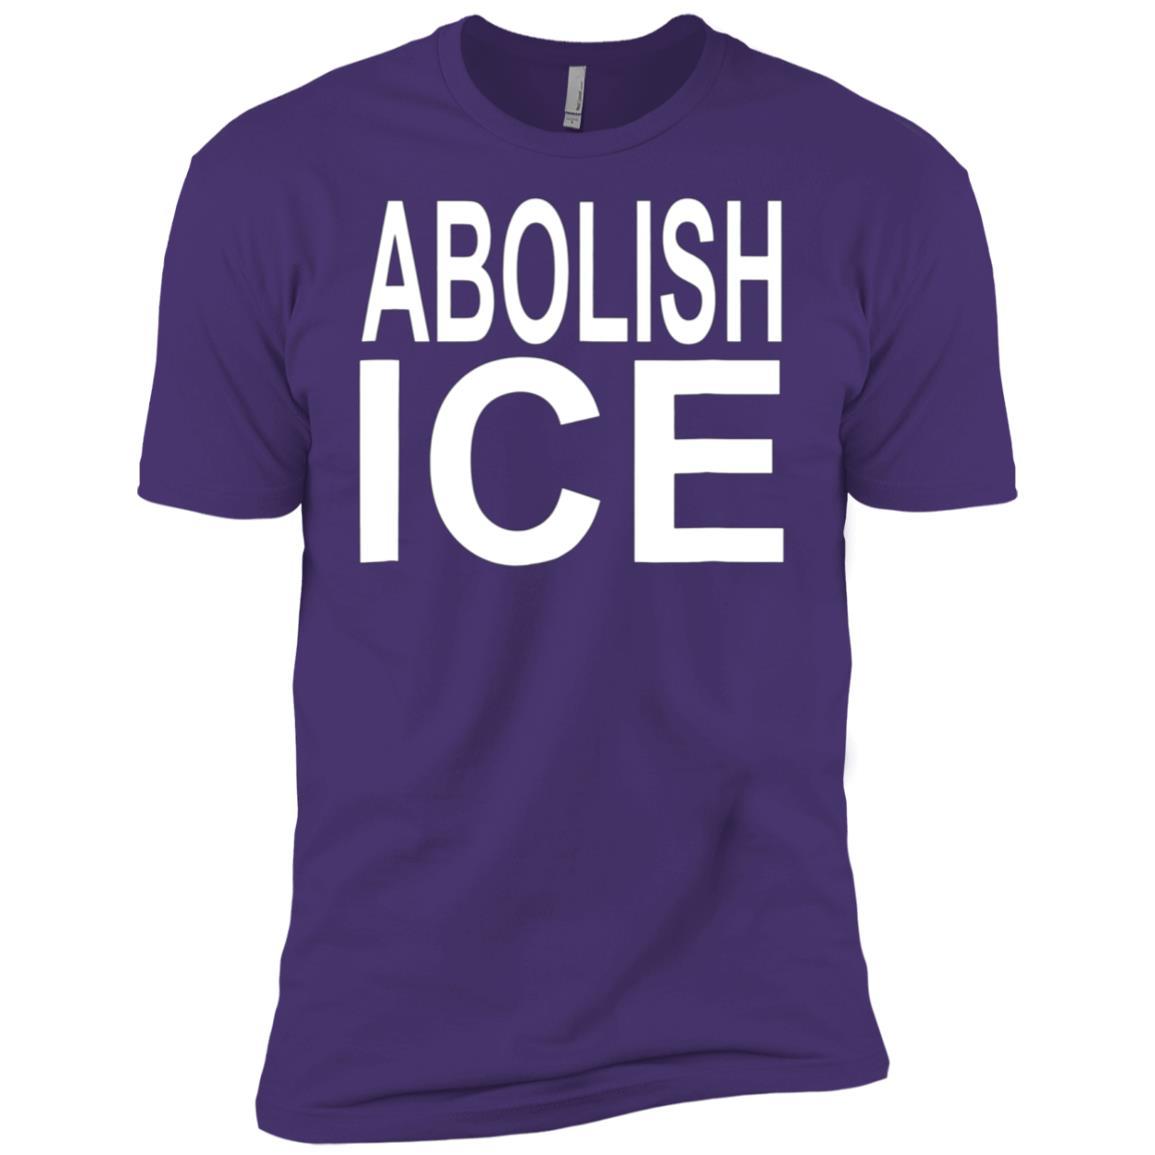 Abolish ICE anti trump immigration Freedom Men Women Men Short Sleeve T-Shirt